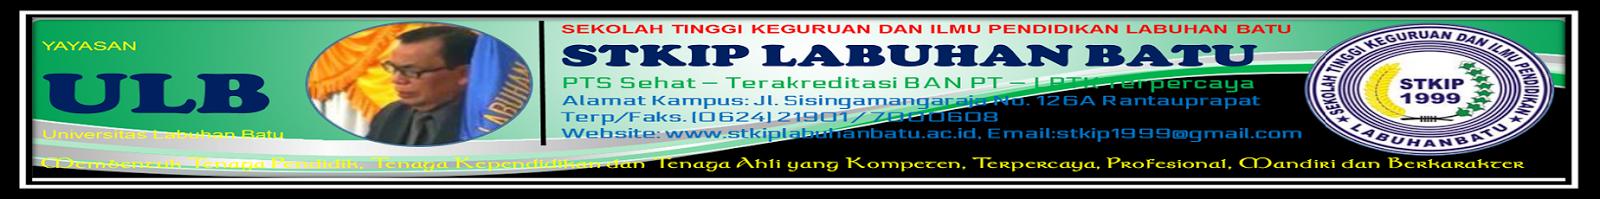 STKIP Labuhan Batu -Yayasan Universitas Labuhan Batu